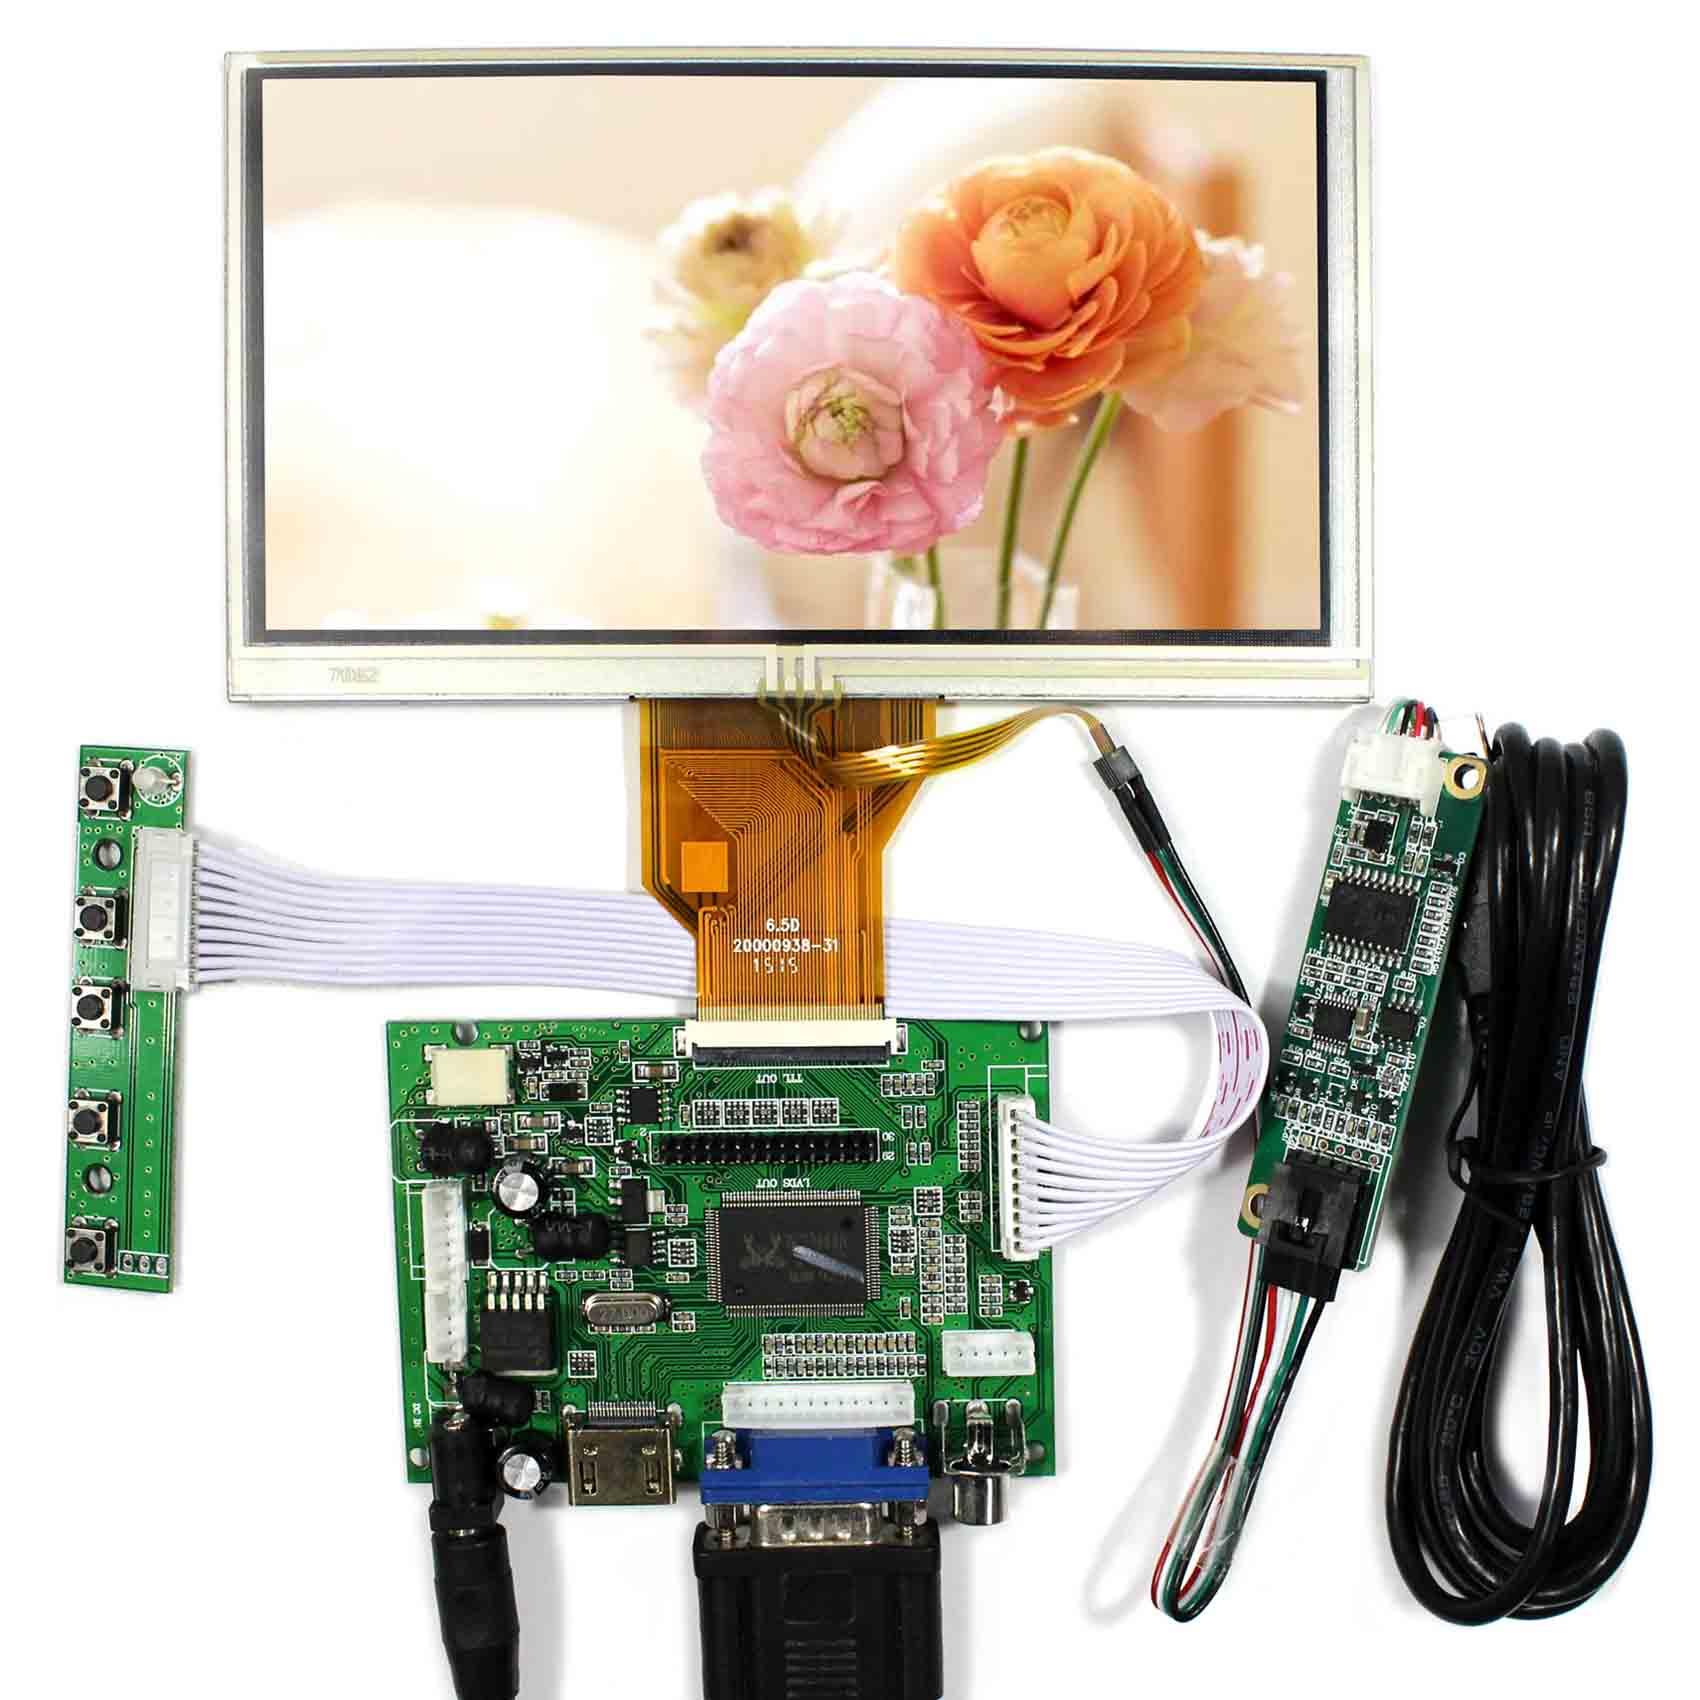 HDMI+VGA+2AV Controller Board VS-TY2662-V1 + 6.5inch 800x480 AT065TN14 LCD Touch Screen цена и фото